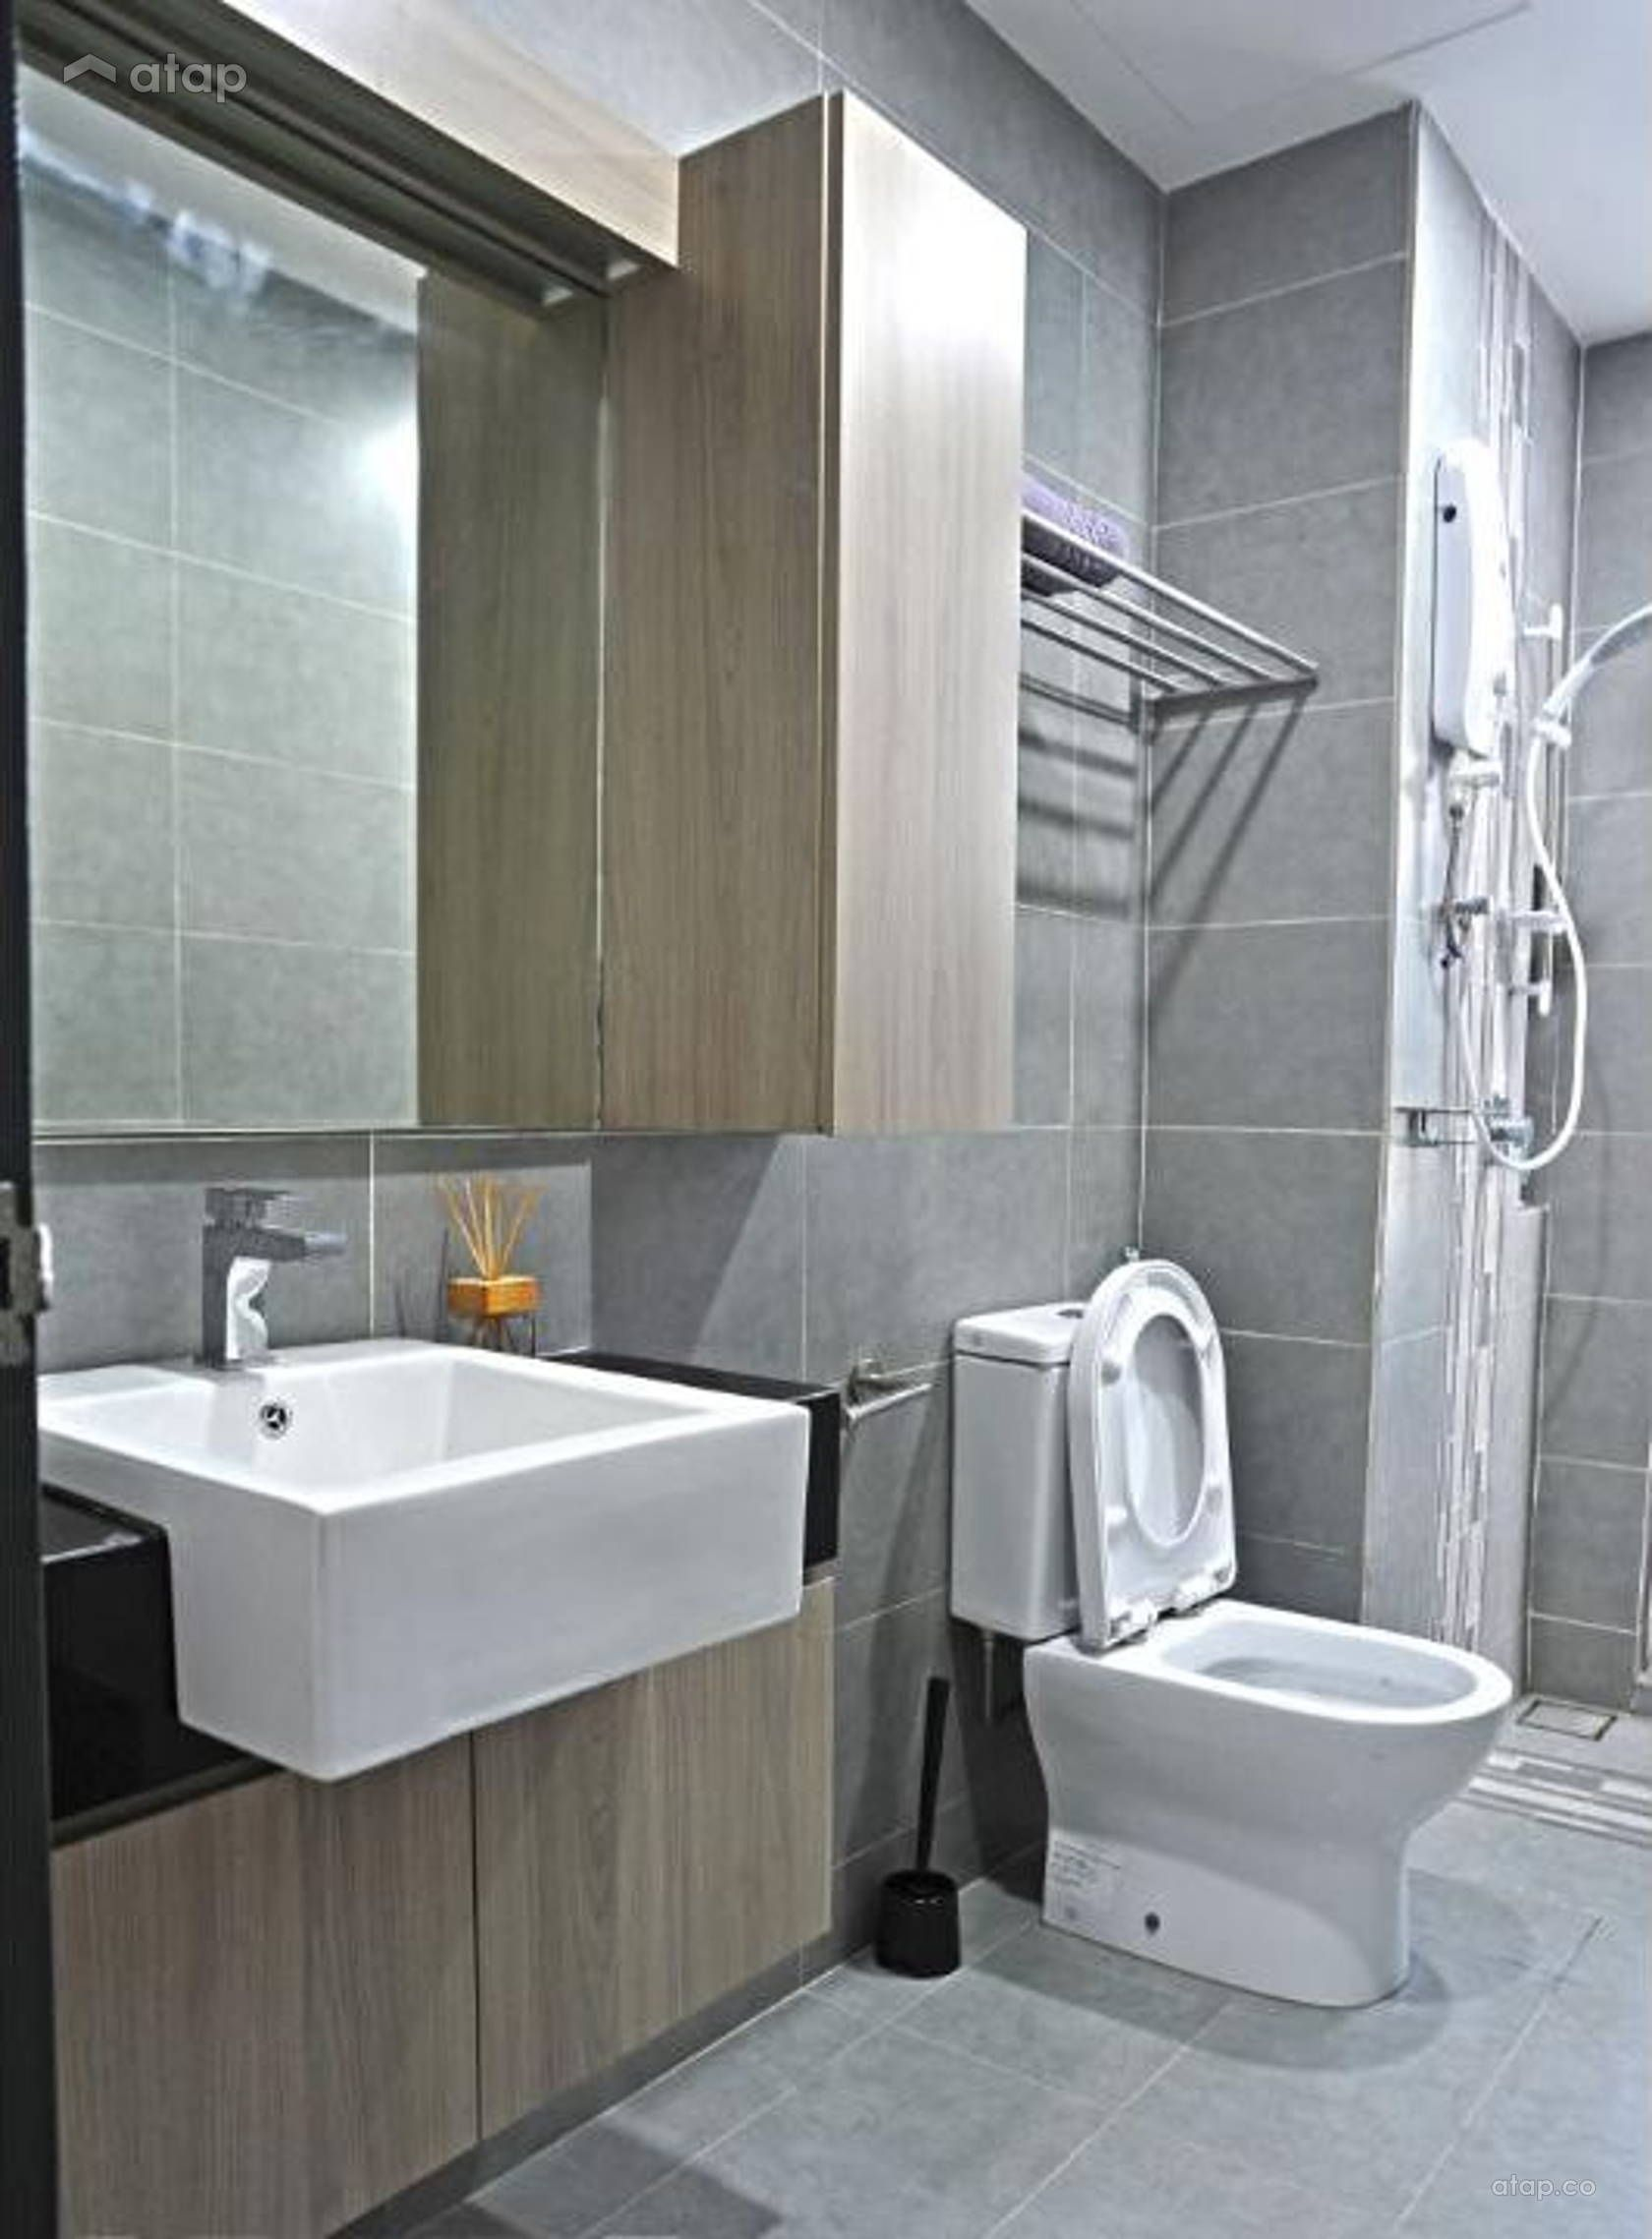 Bathroom Condominium Design Ideas Photos Malaysia Atap Co Hotel Bathroom Design Bathroom Design Bathroom Remodel Designs